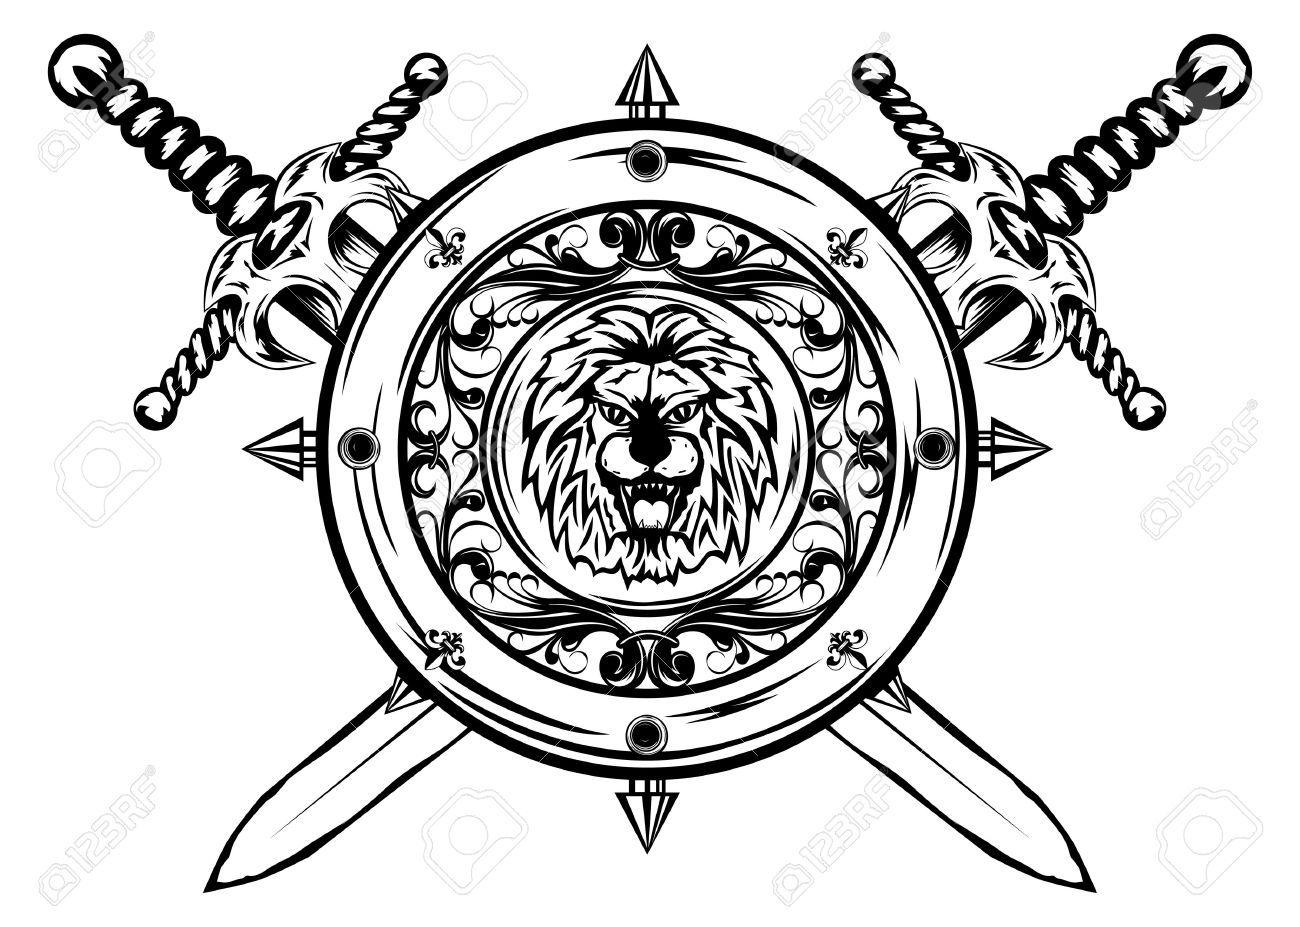 Triforce linework. Stock vector tattoo sword